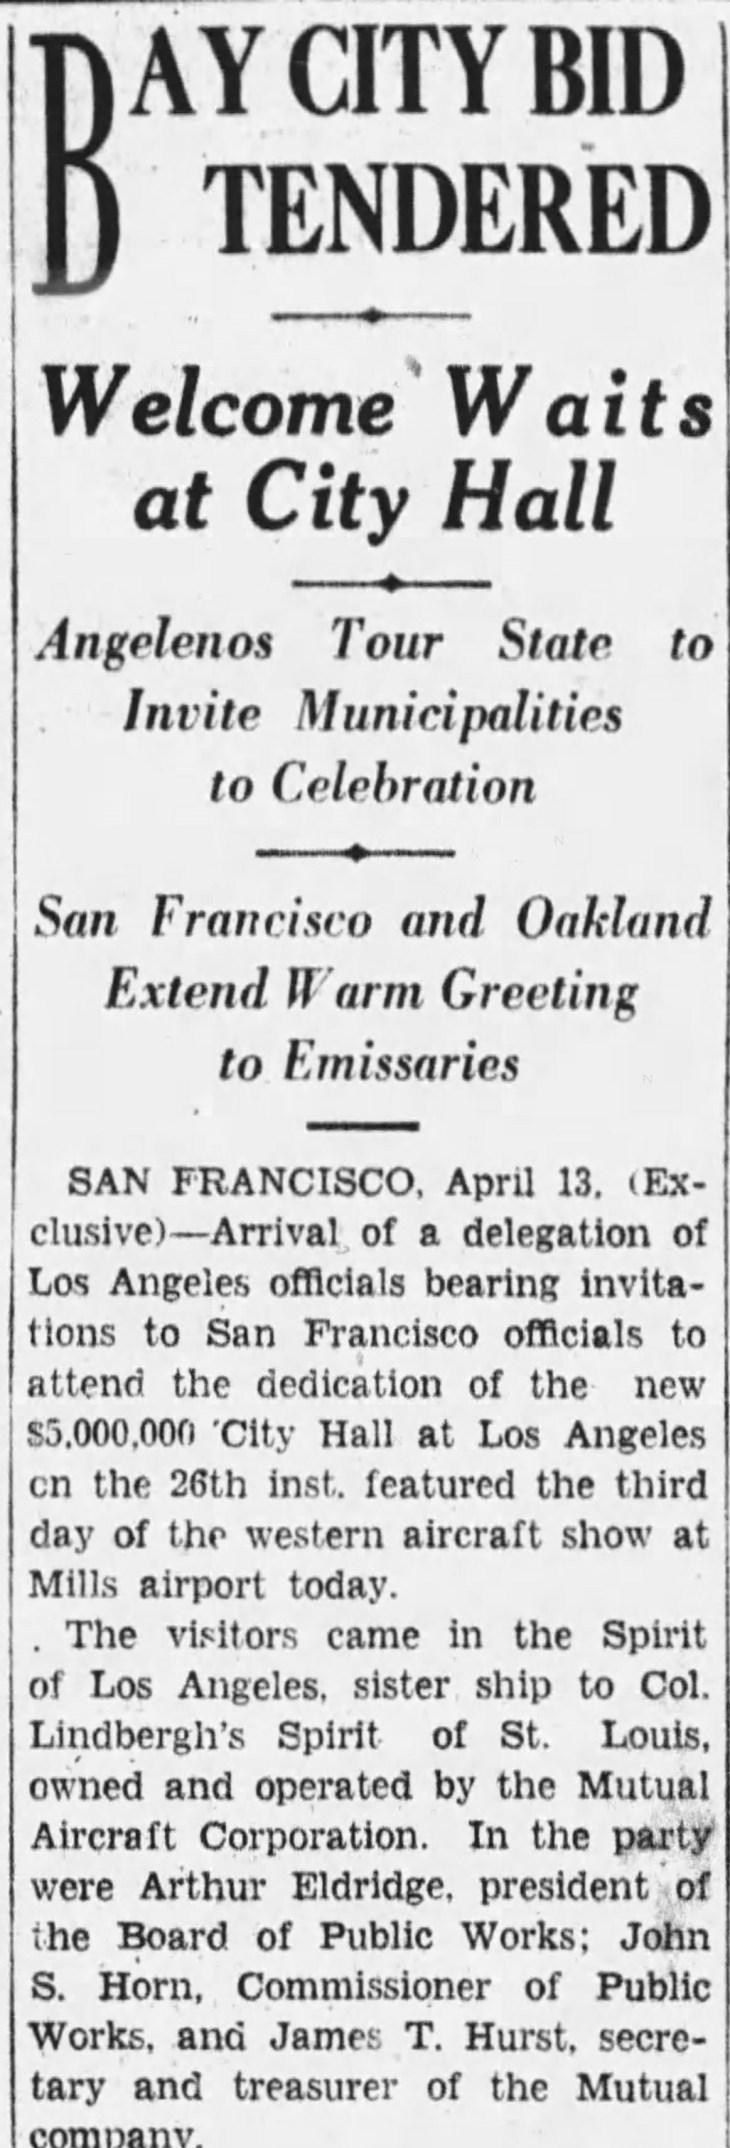 The_Los_Angeles_Times_Sat__Apr_14__1928_